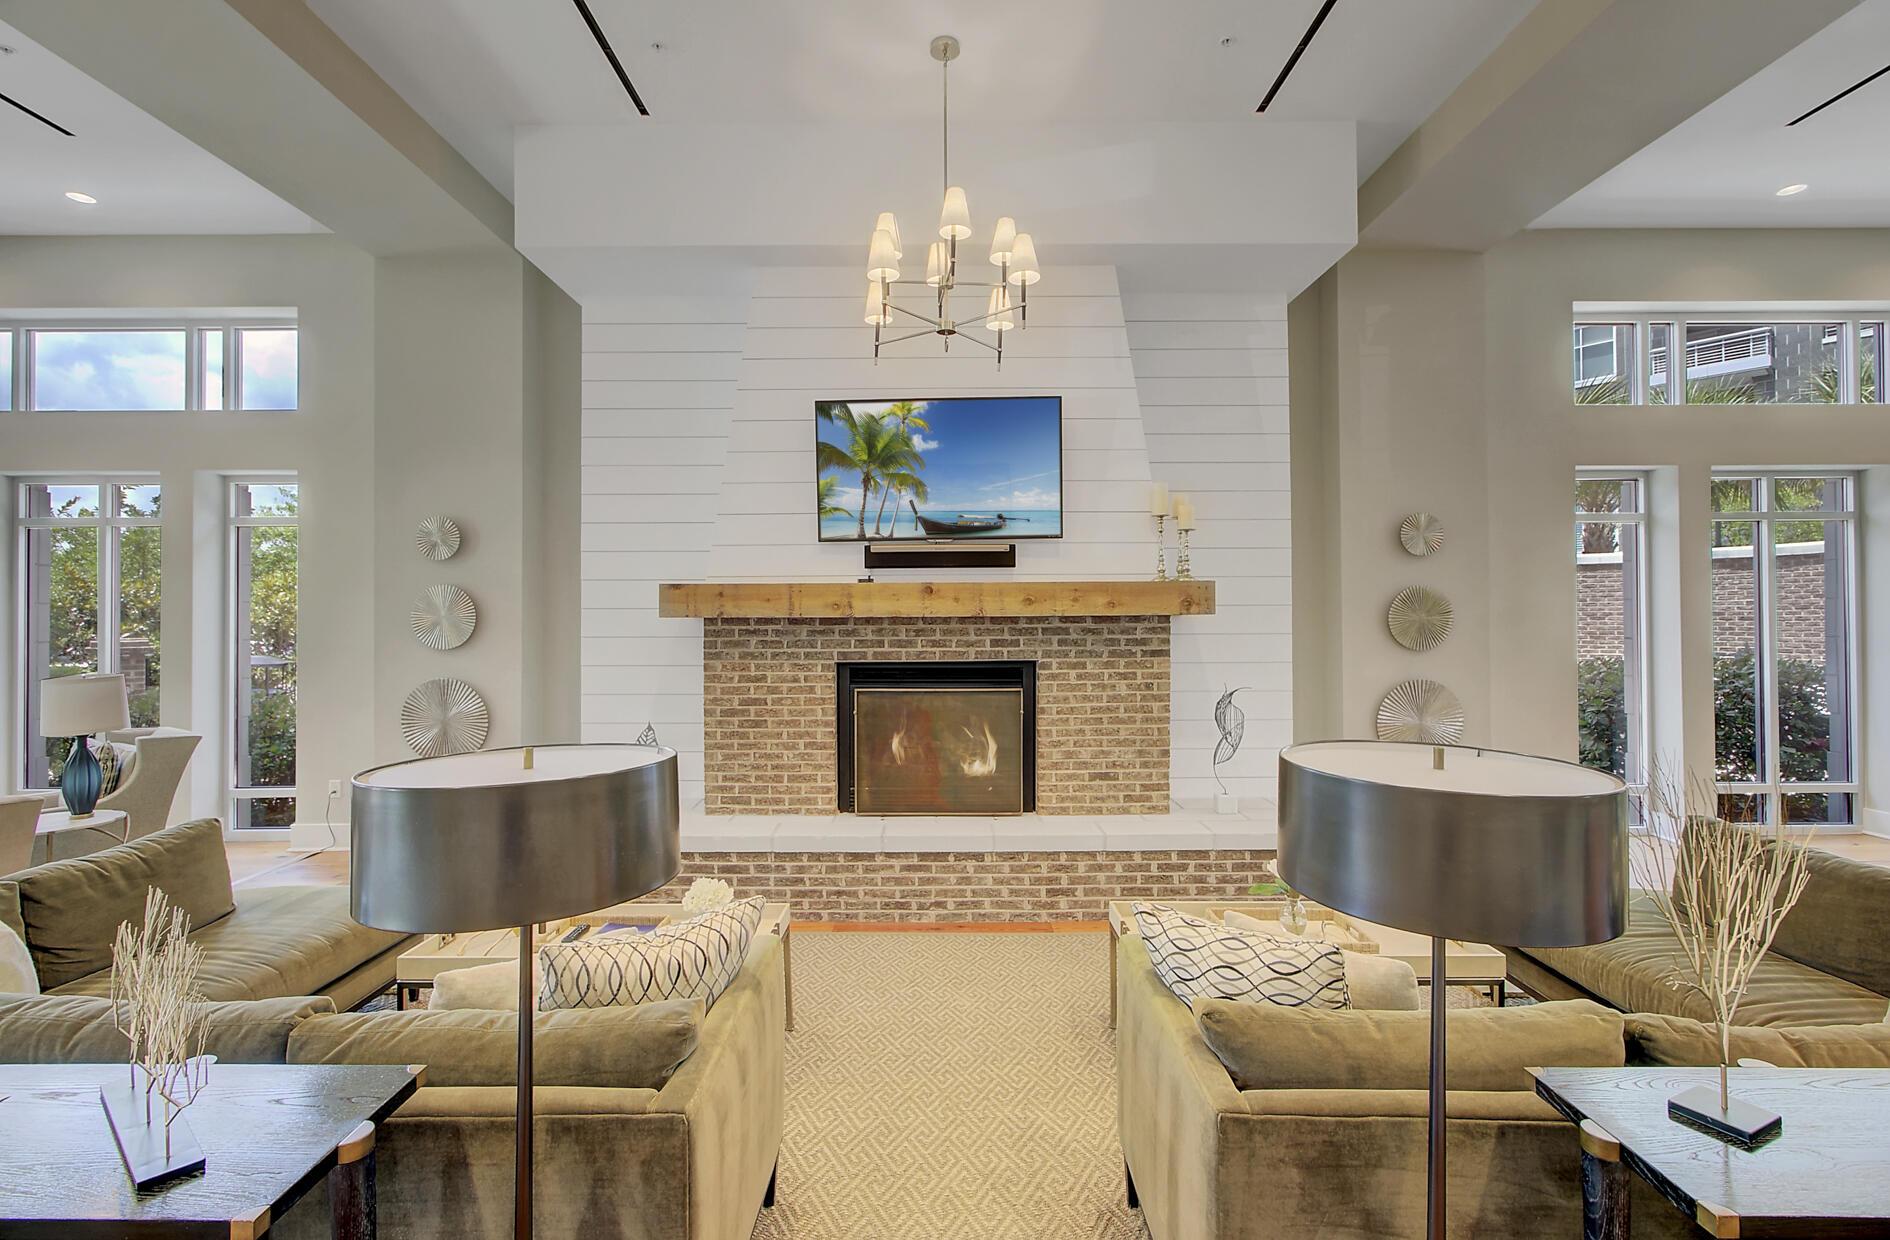 Tides IV Condominiums Homes For Sale - 155 Wingo Way, Mount Pleasant, SC - 15